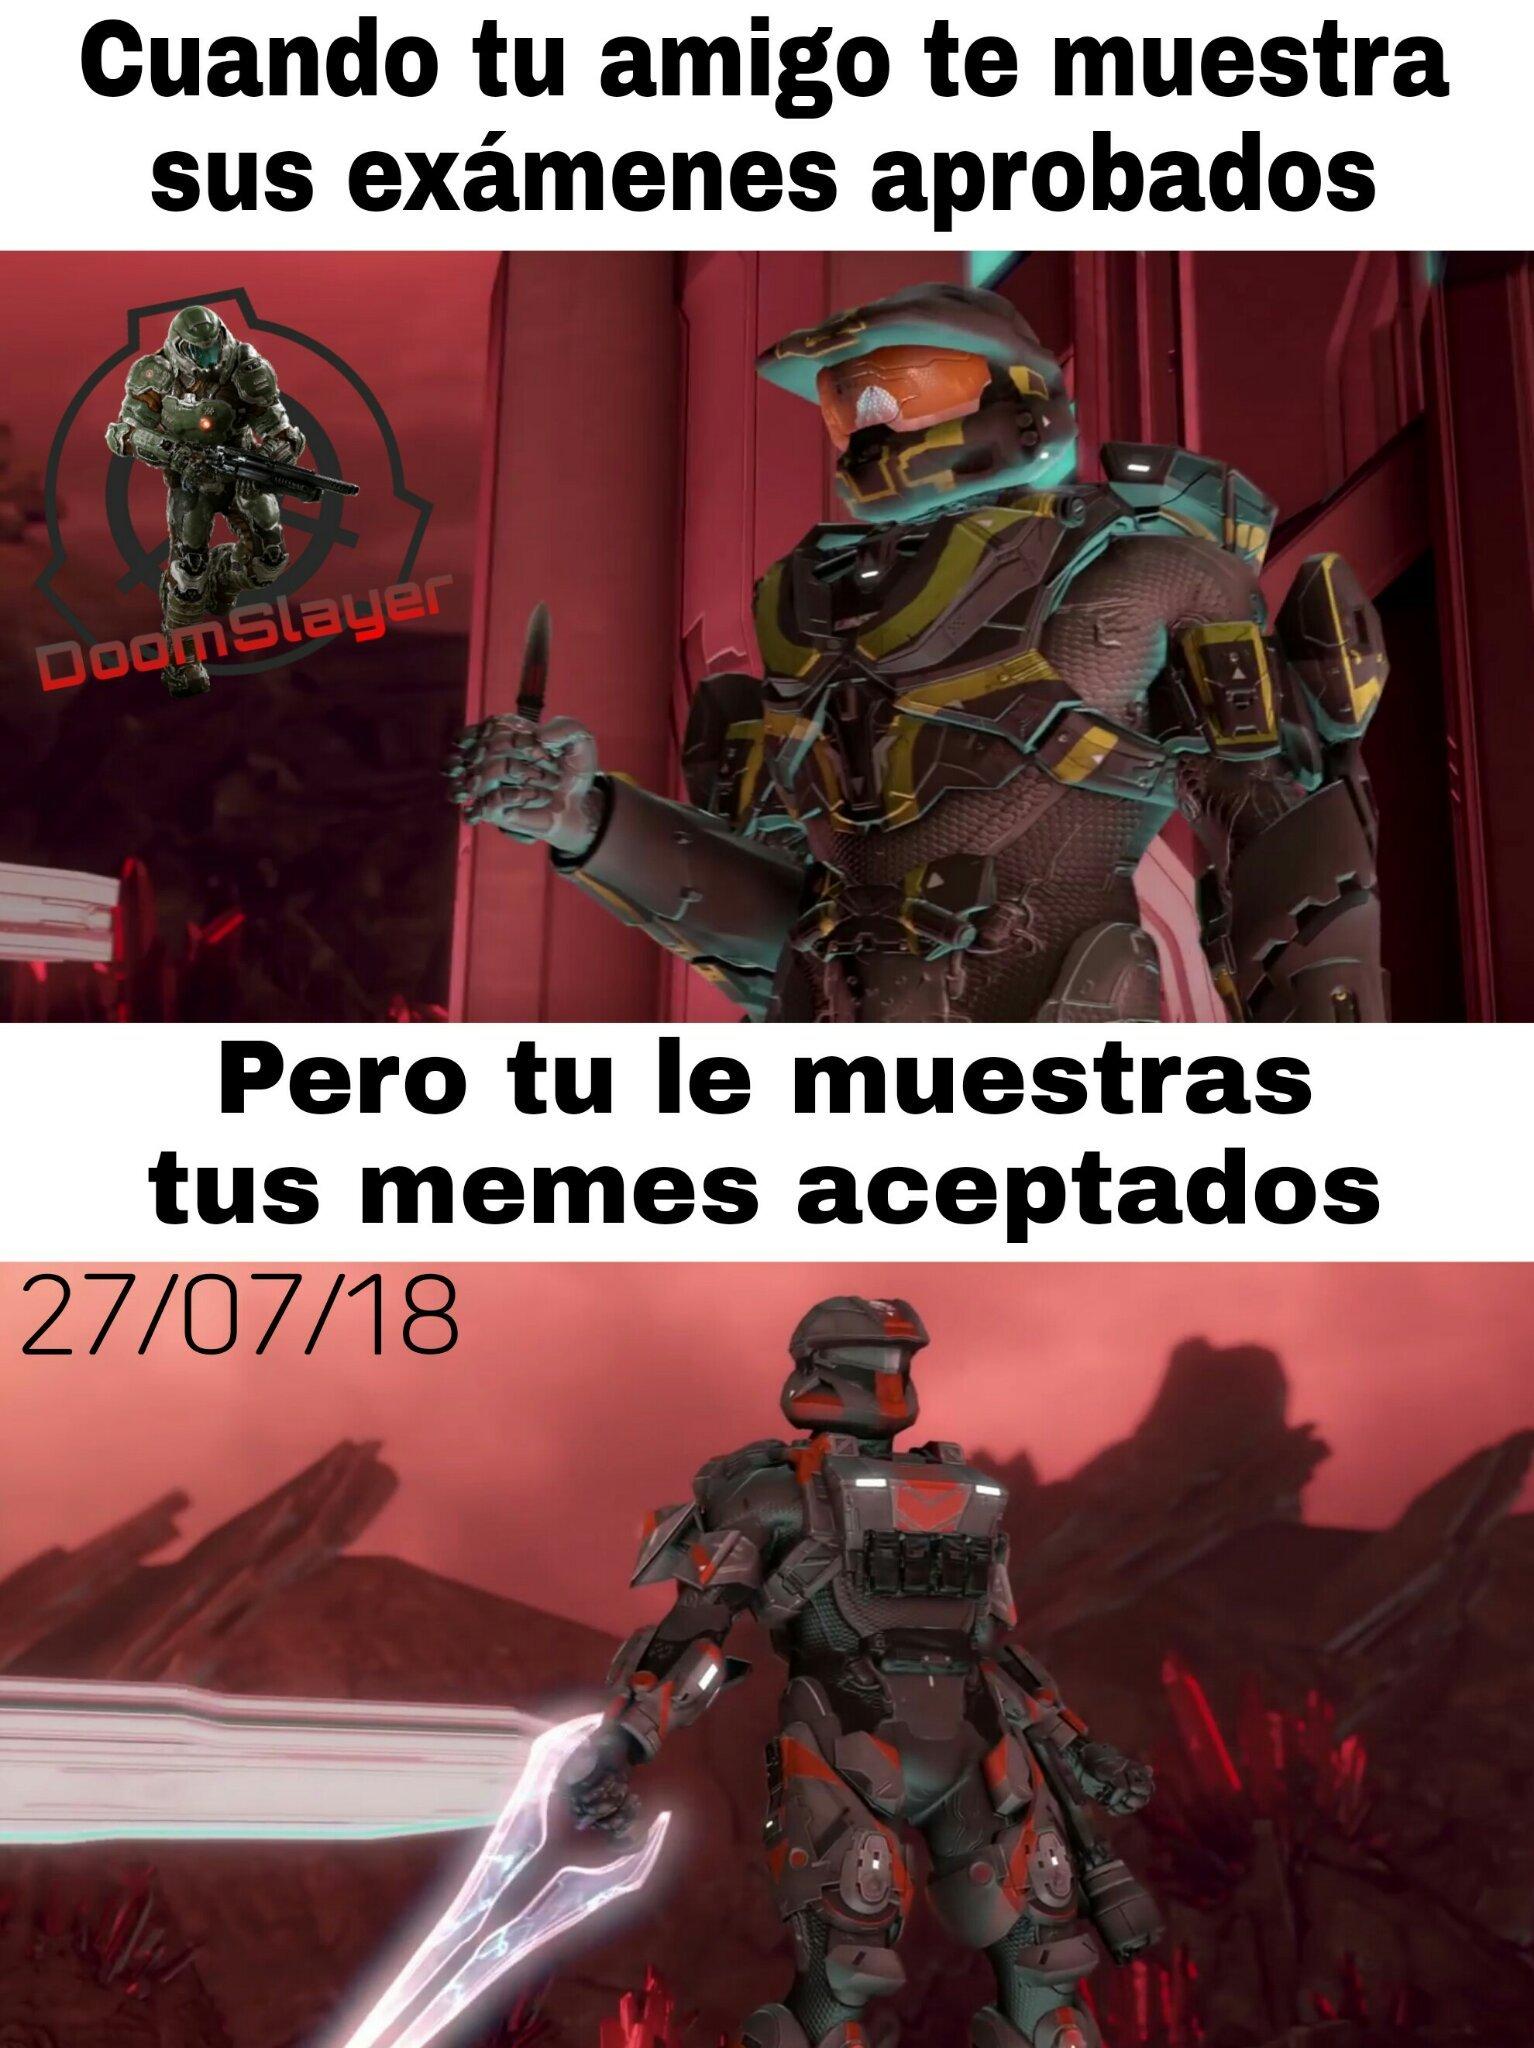 TRAFICANDO RIMAS - meme